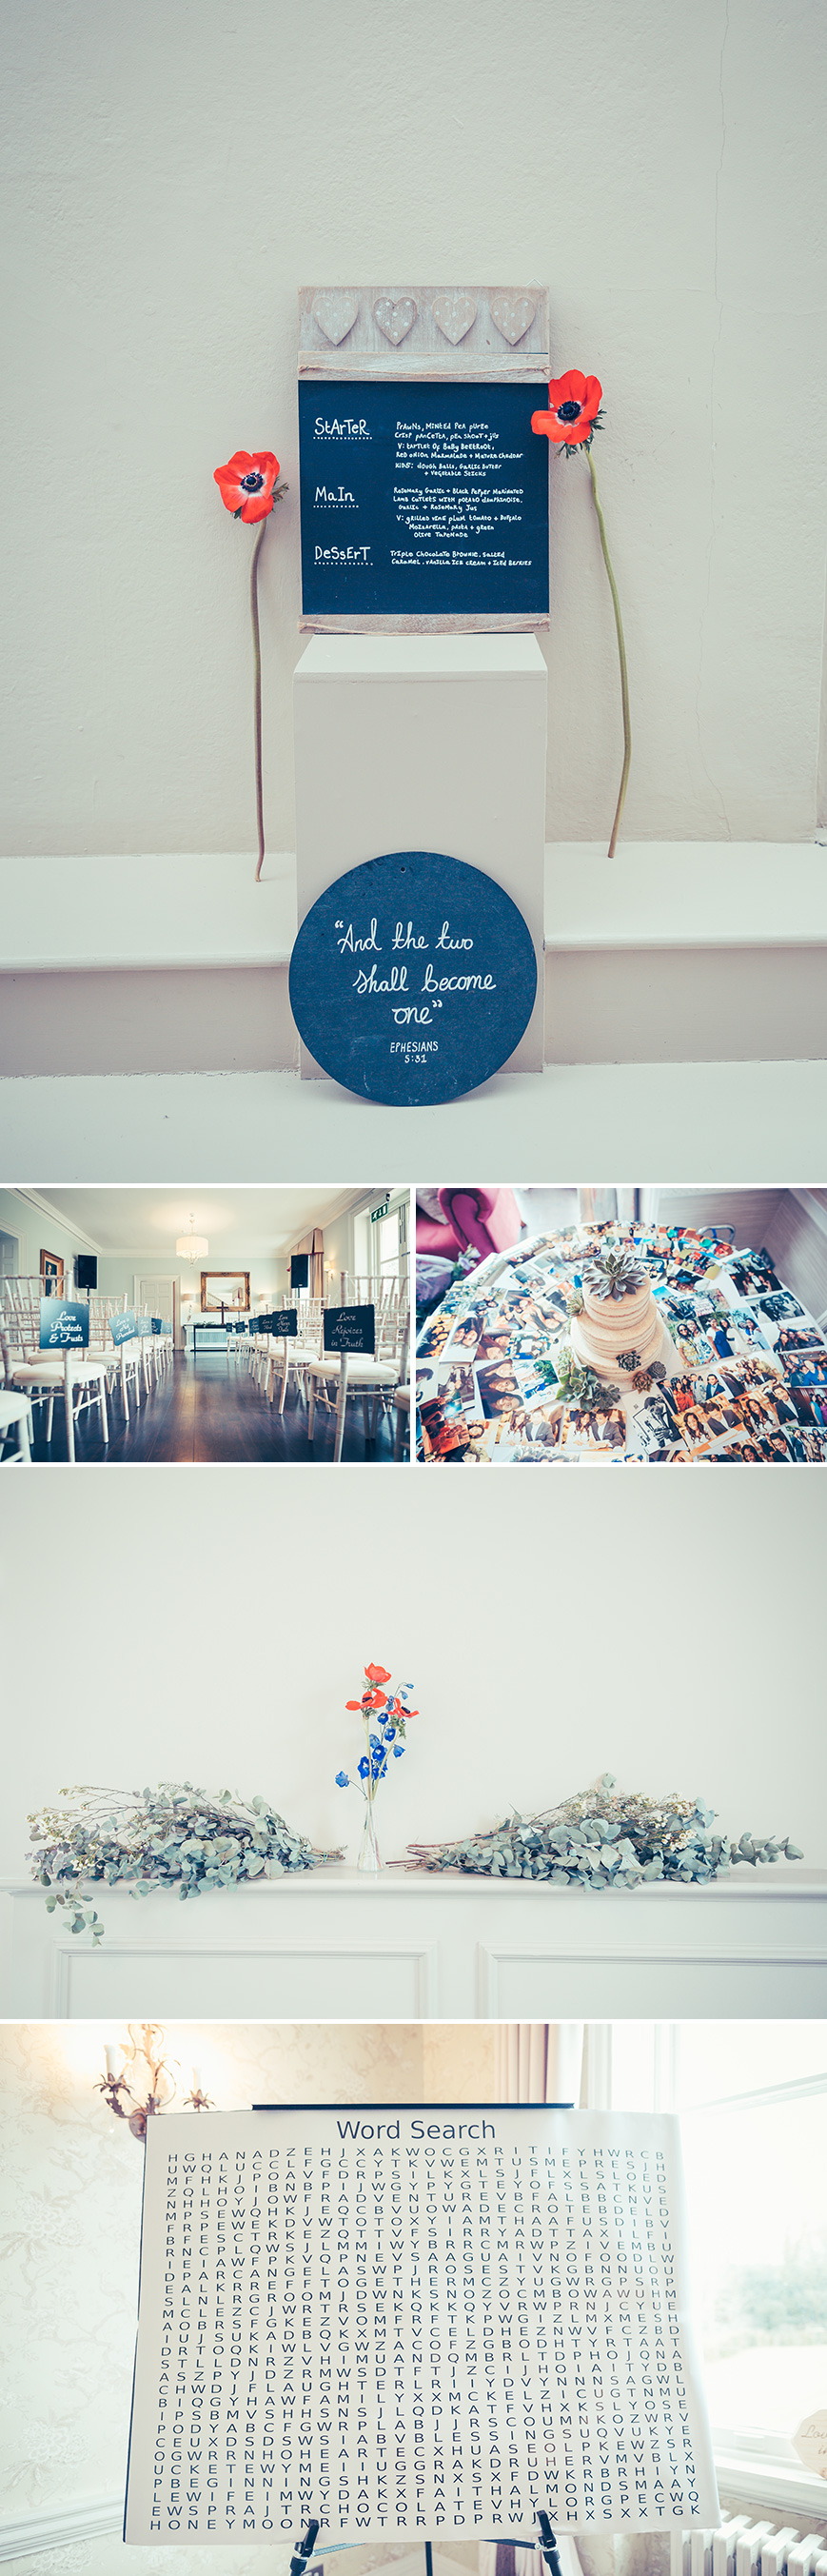 Angela and Praj's Handmade Wedding in London - Family DIY | CHWV